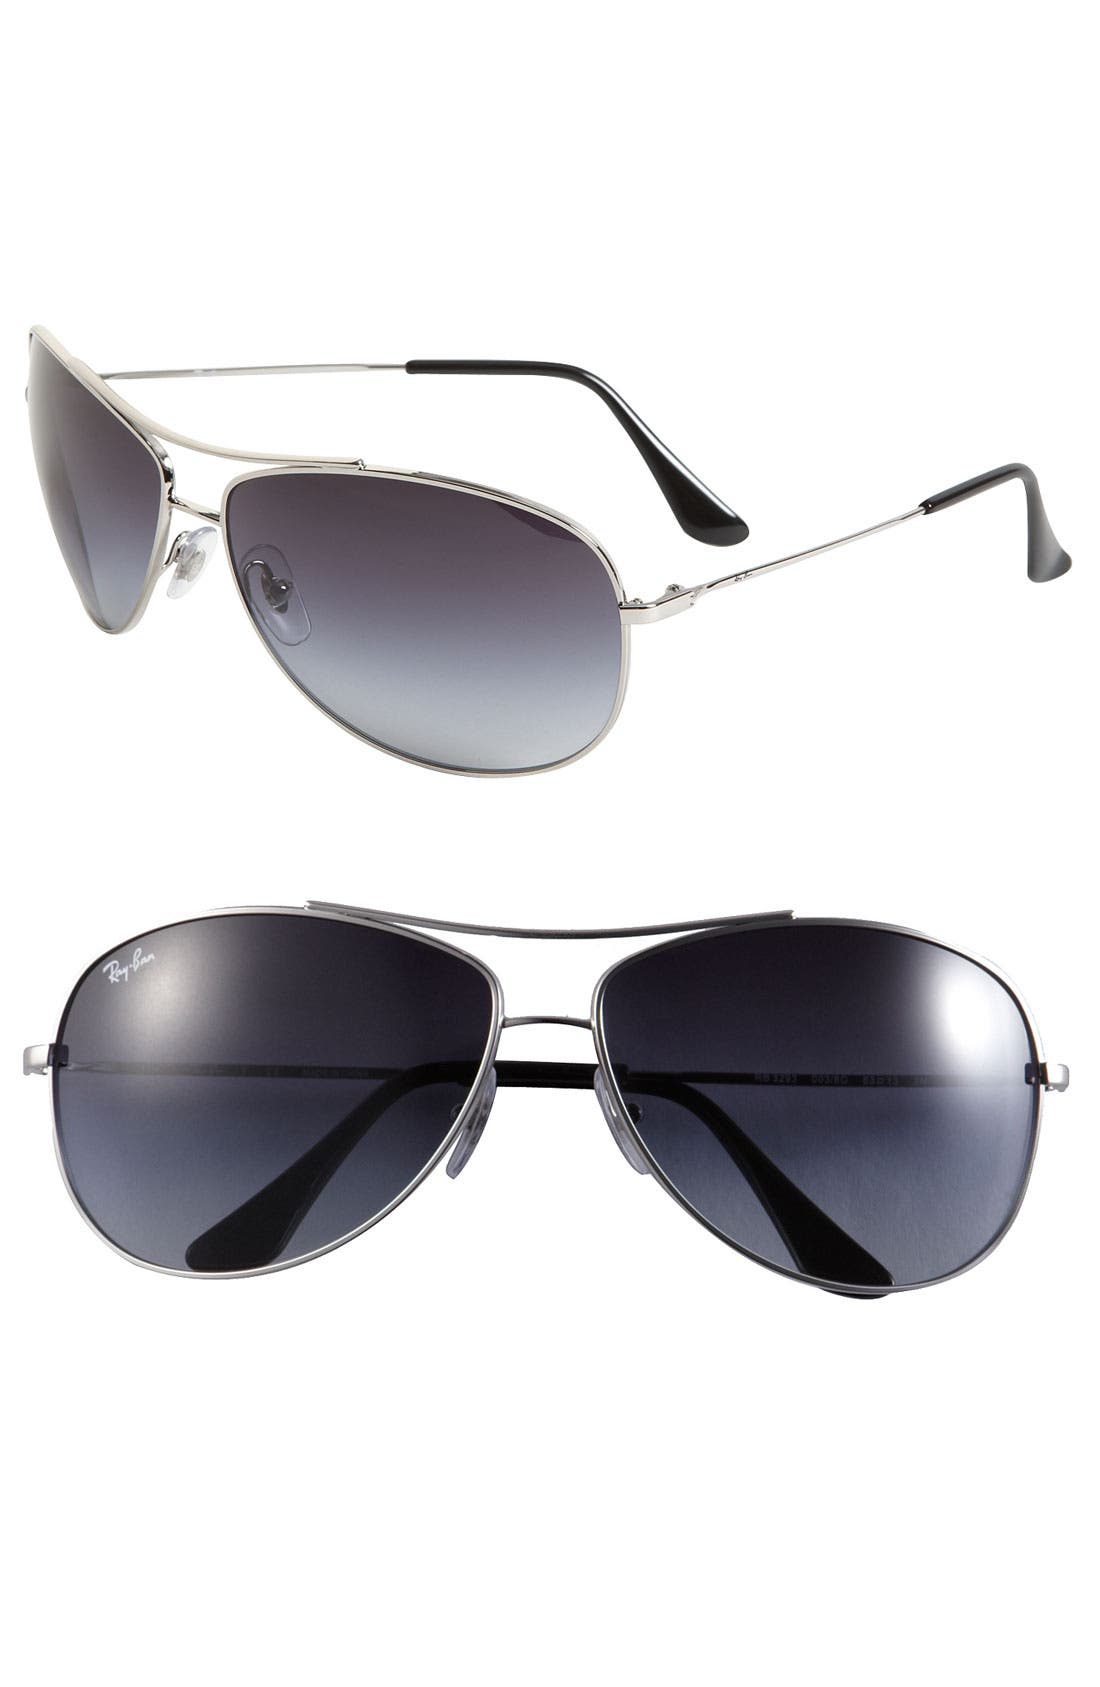 Main Image - Ray-Ban 'Bubble Wrap' 63mm Aviator Sunglasses